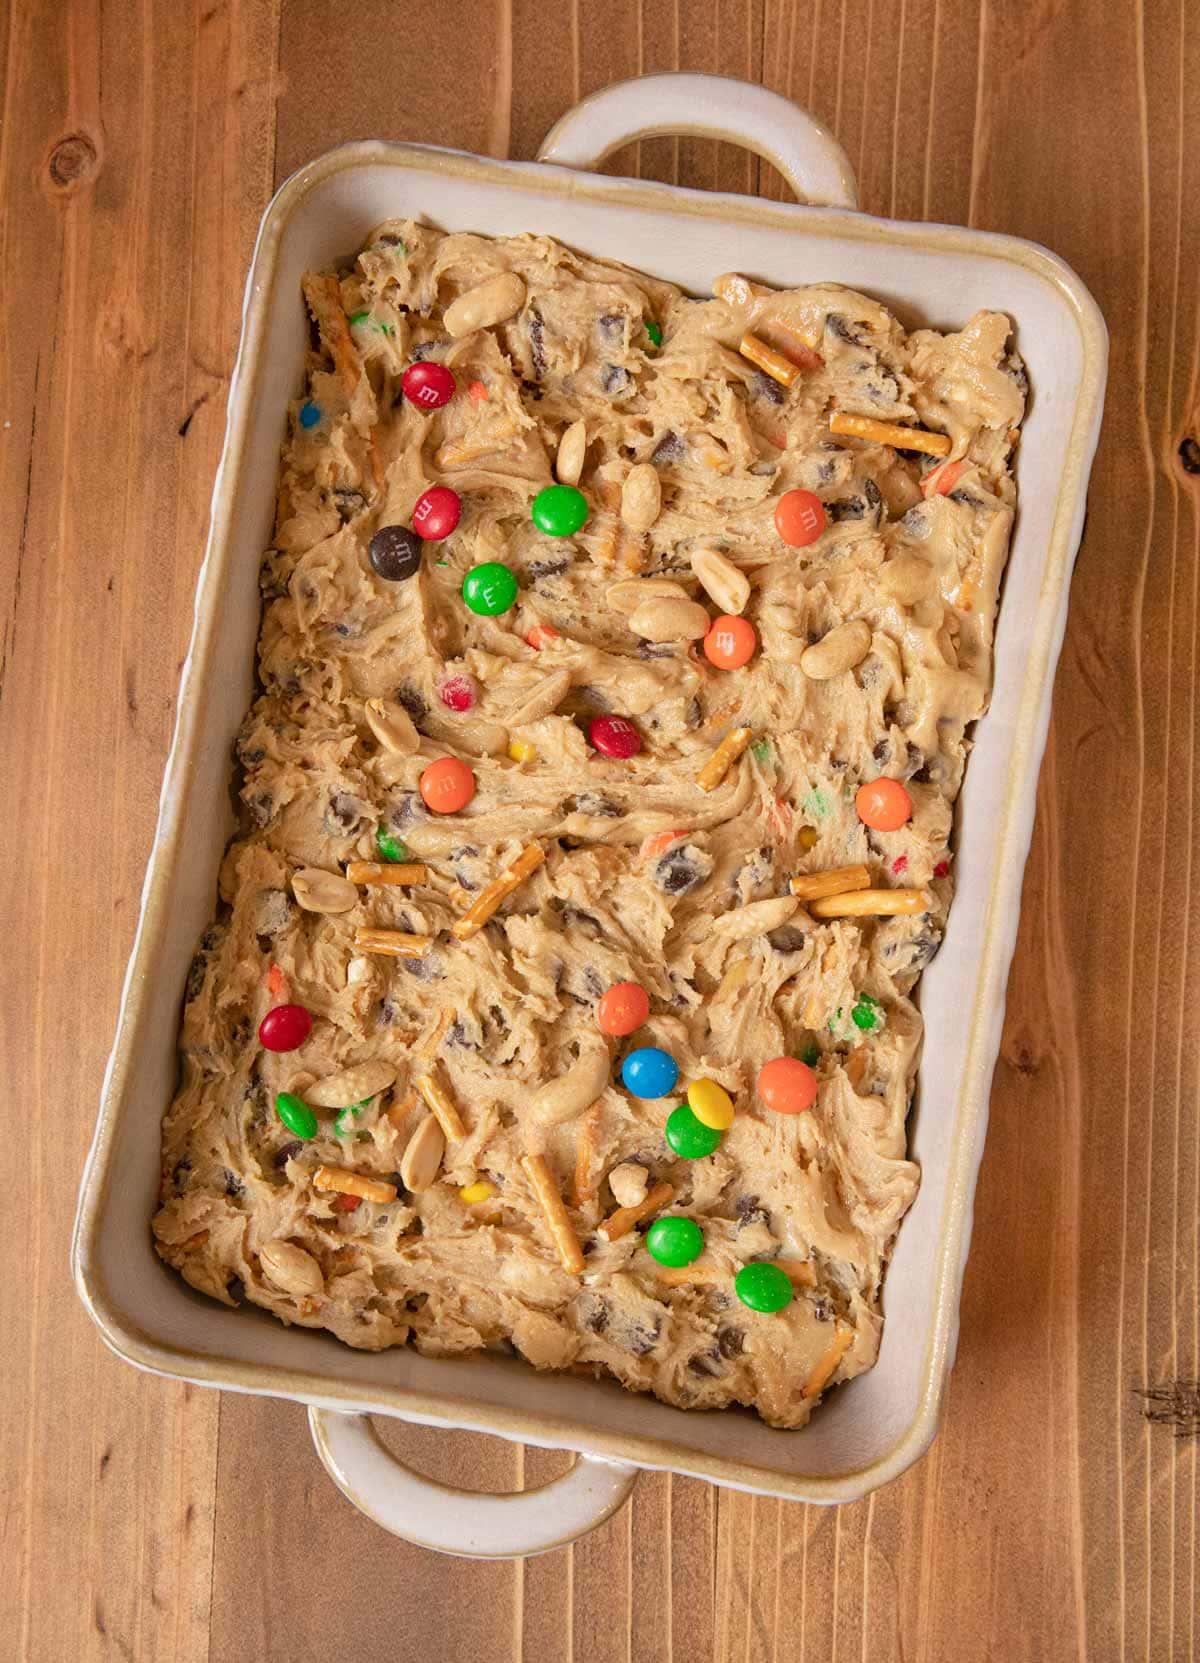 Trail Mix Blondies in baking dish before baking